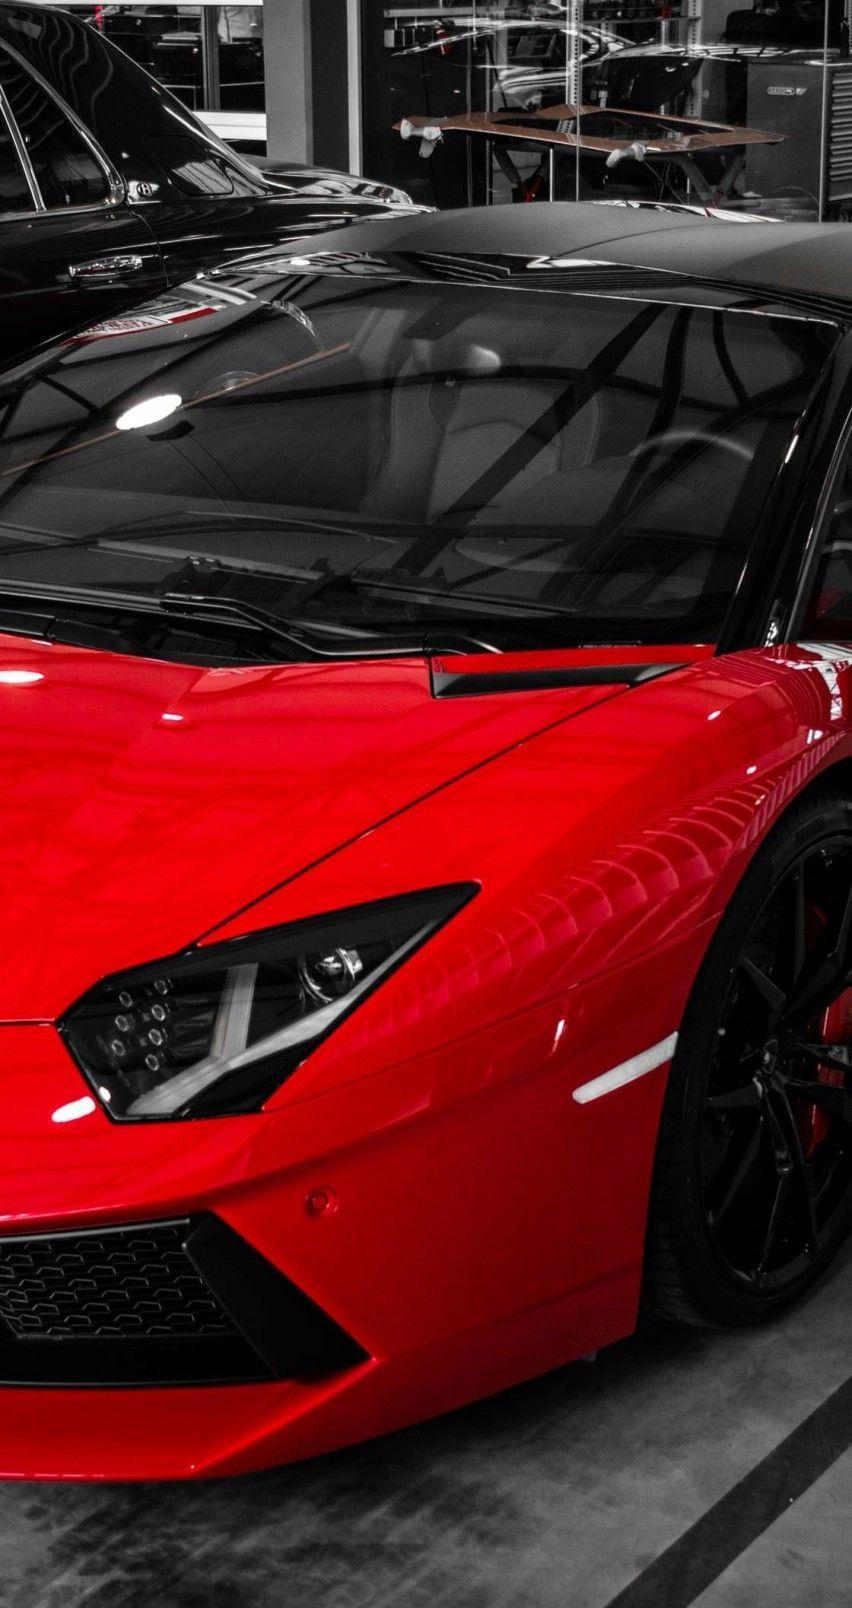 2560x1600 Lamborghini Wallpapers HD